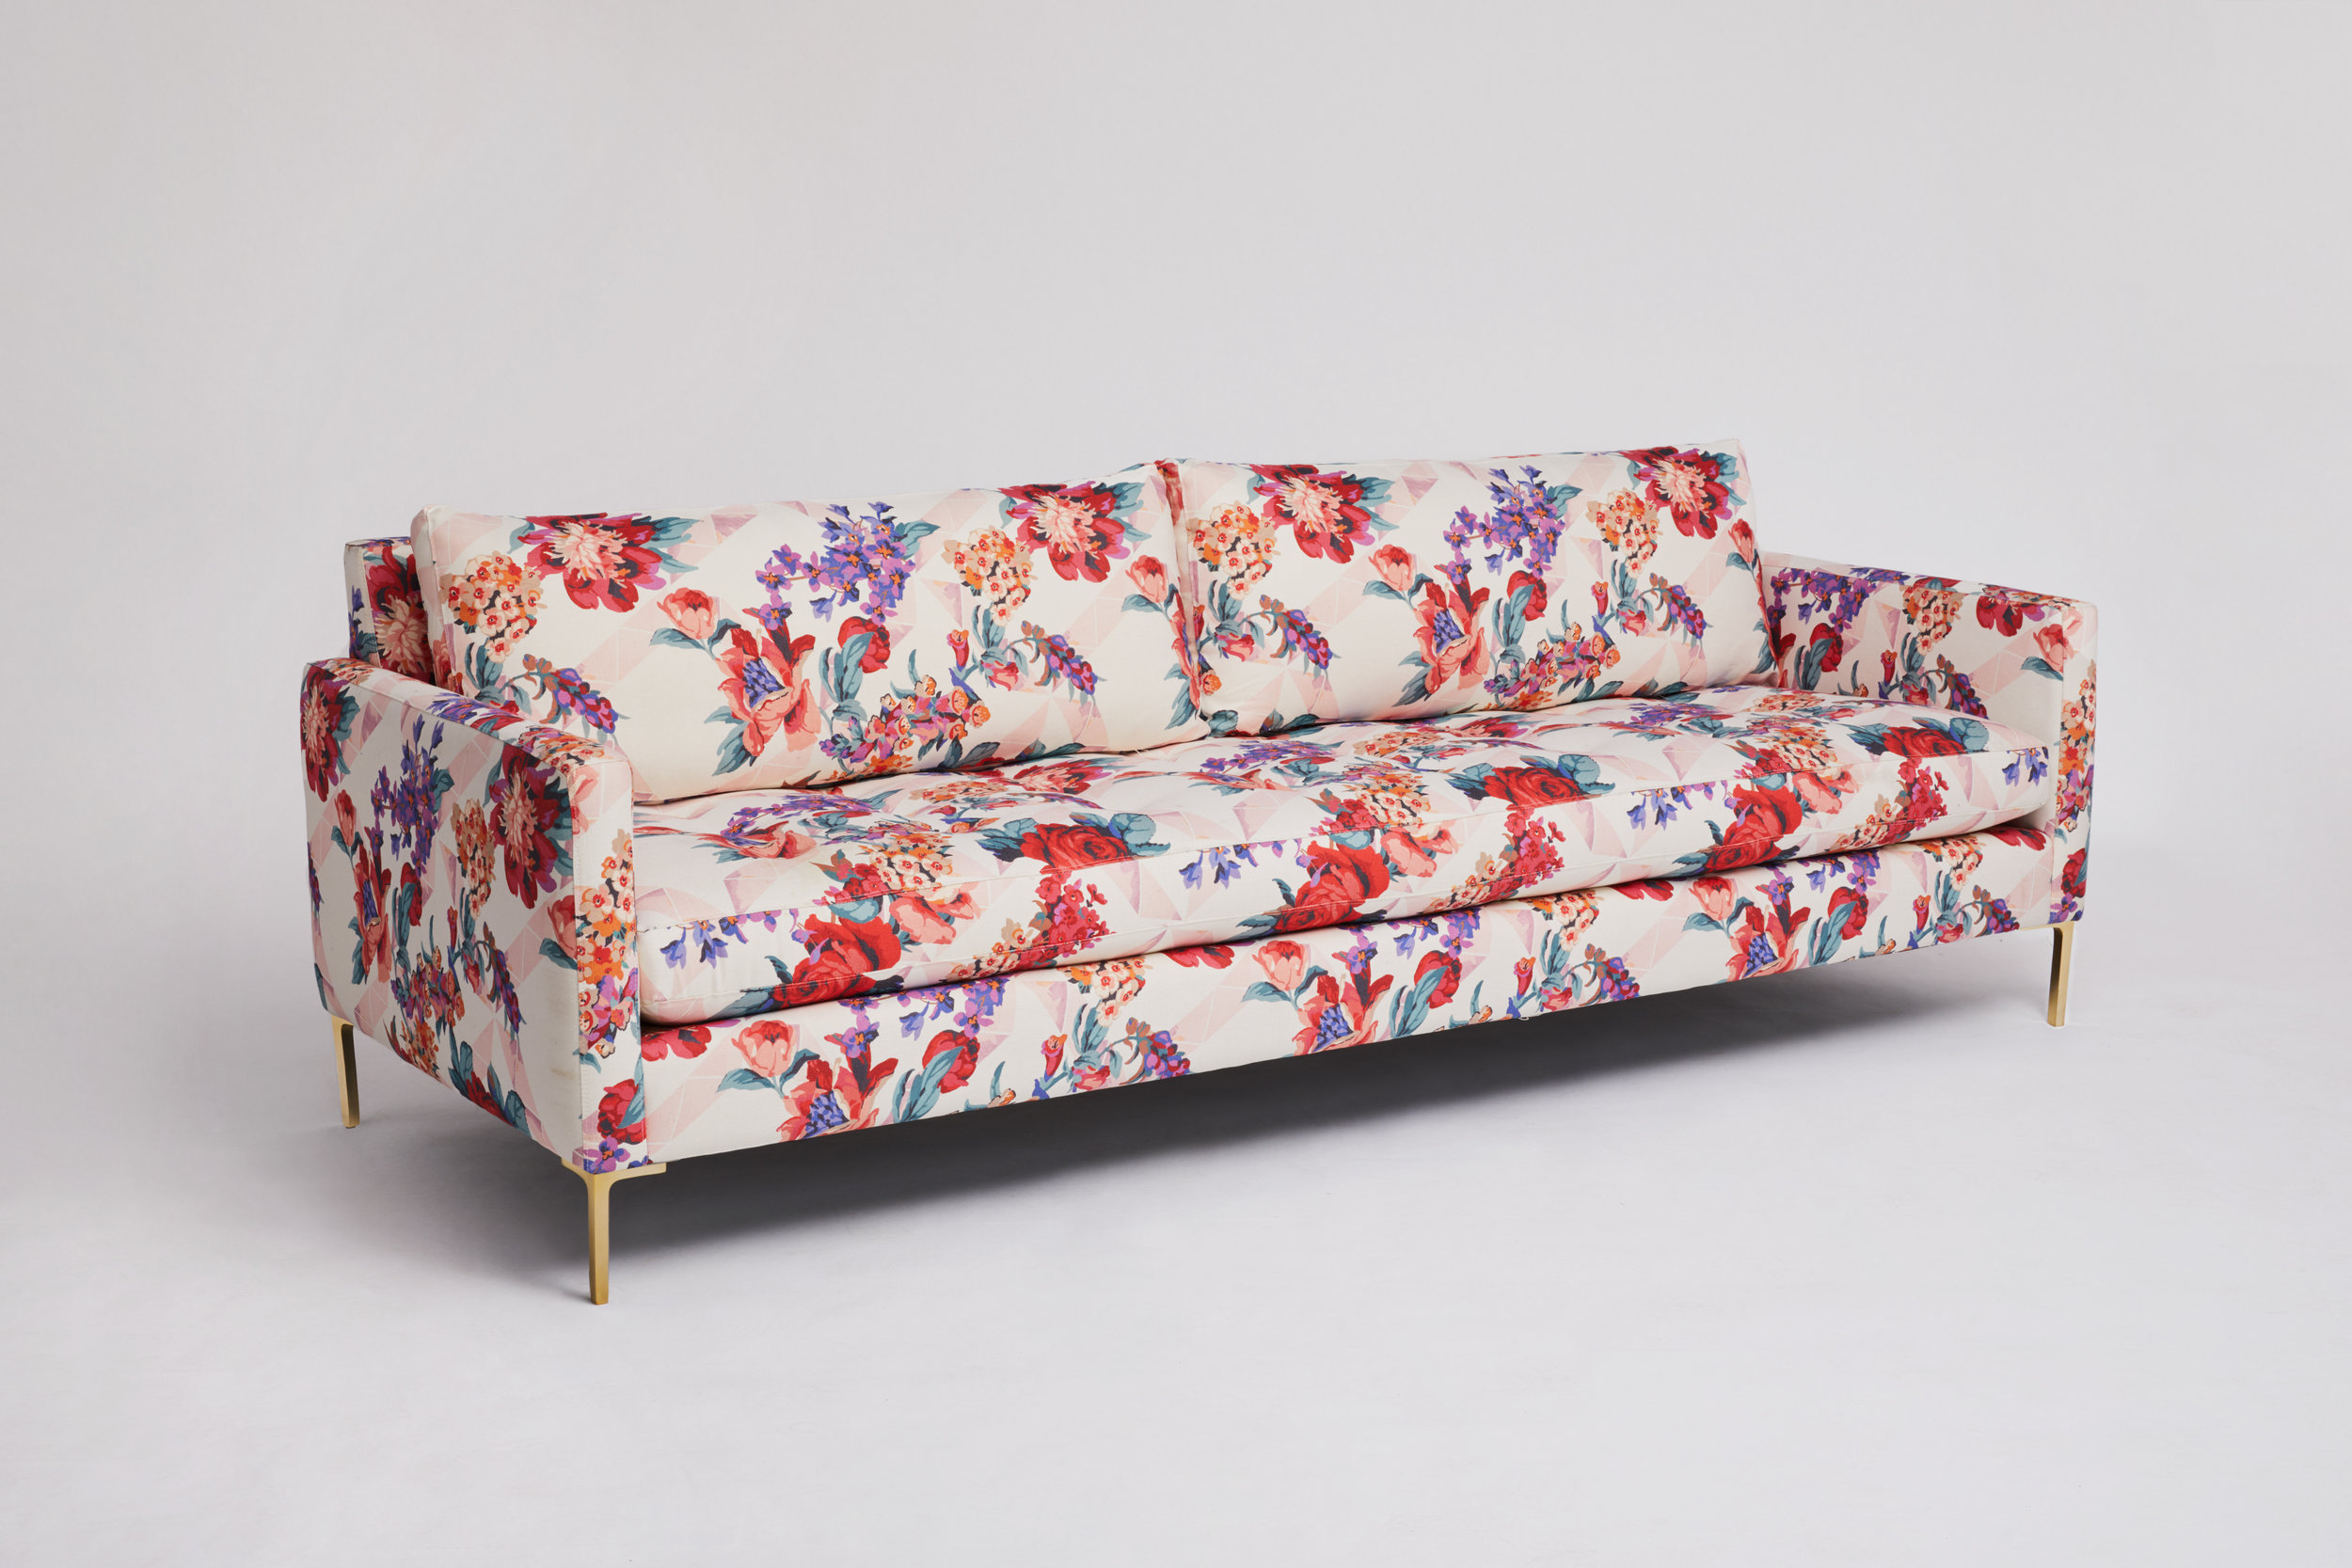 Liberty Angelina Sofa in Geometric Floral.jpg